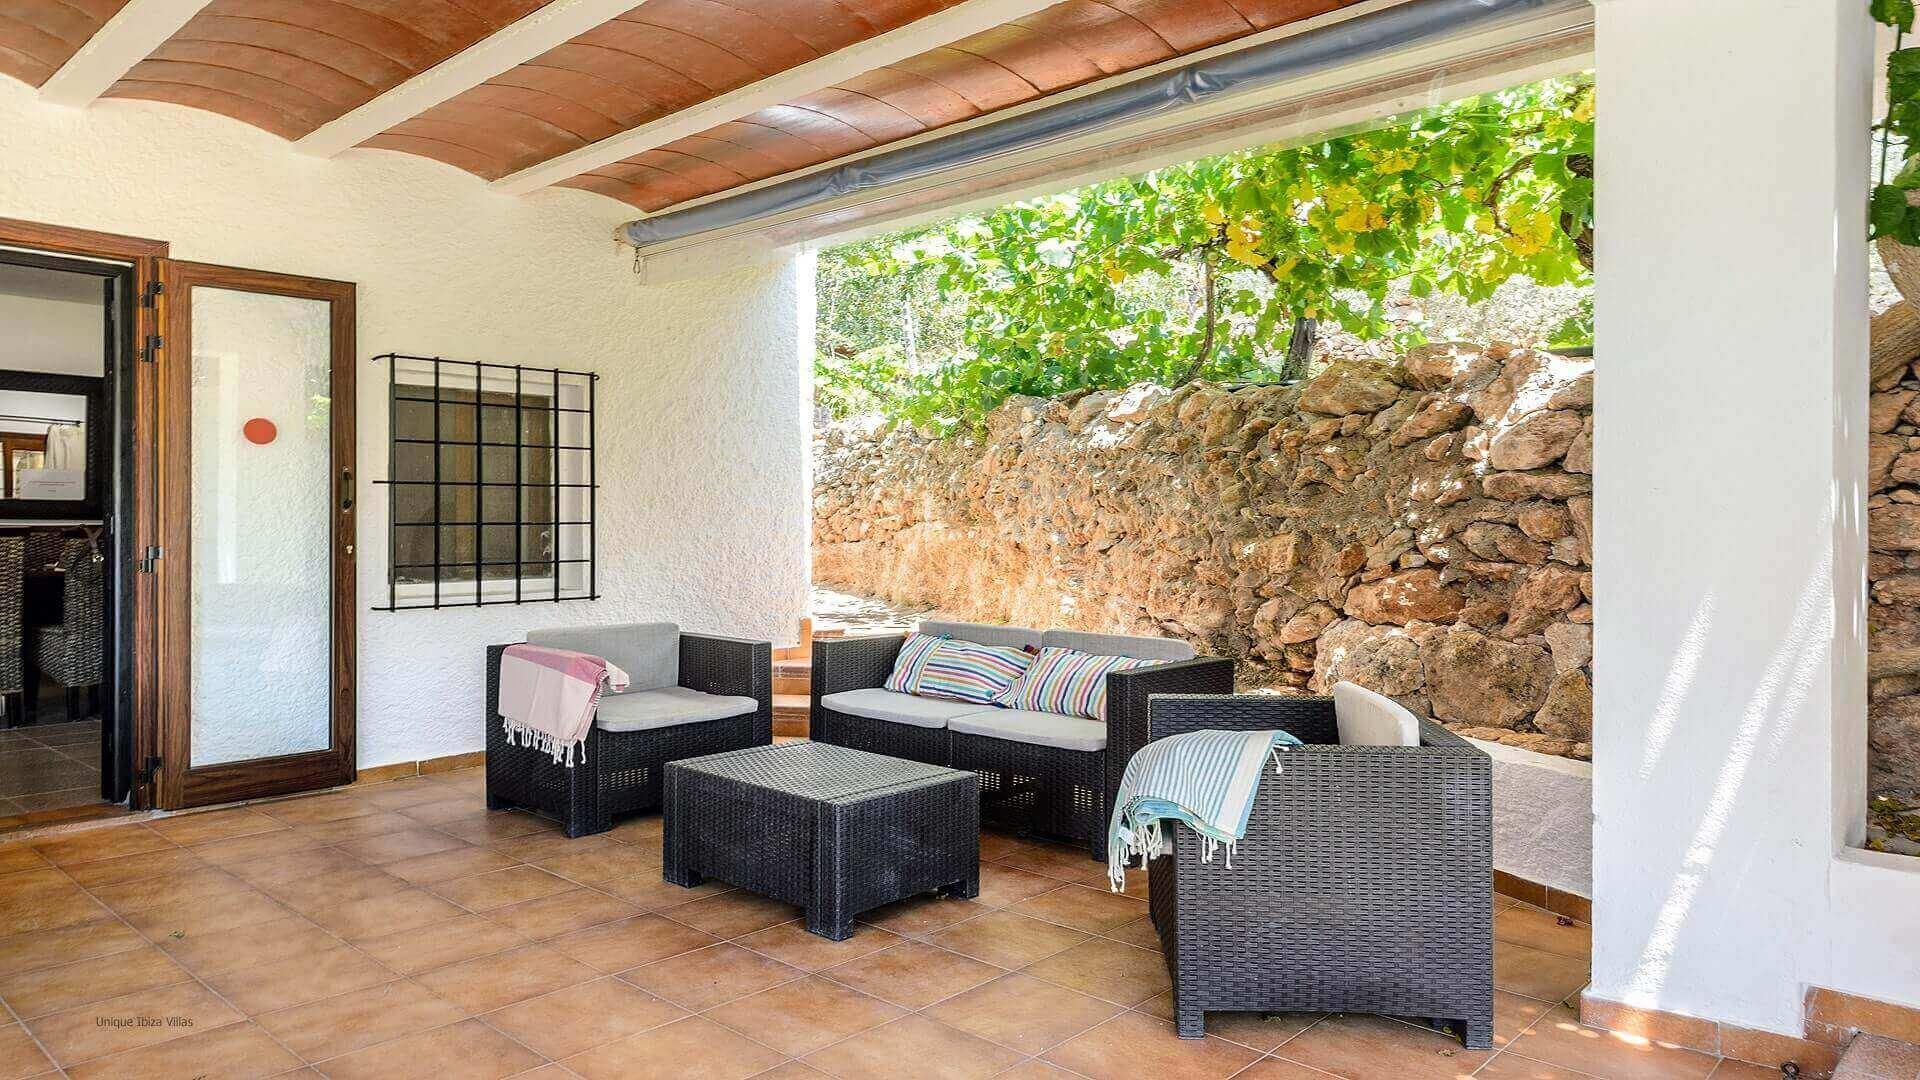 Casa Benirras Ibiza 15 Near Benirras